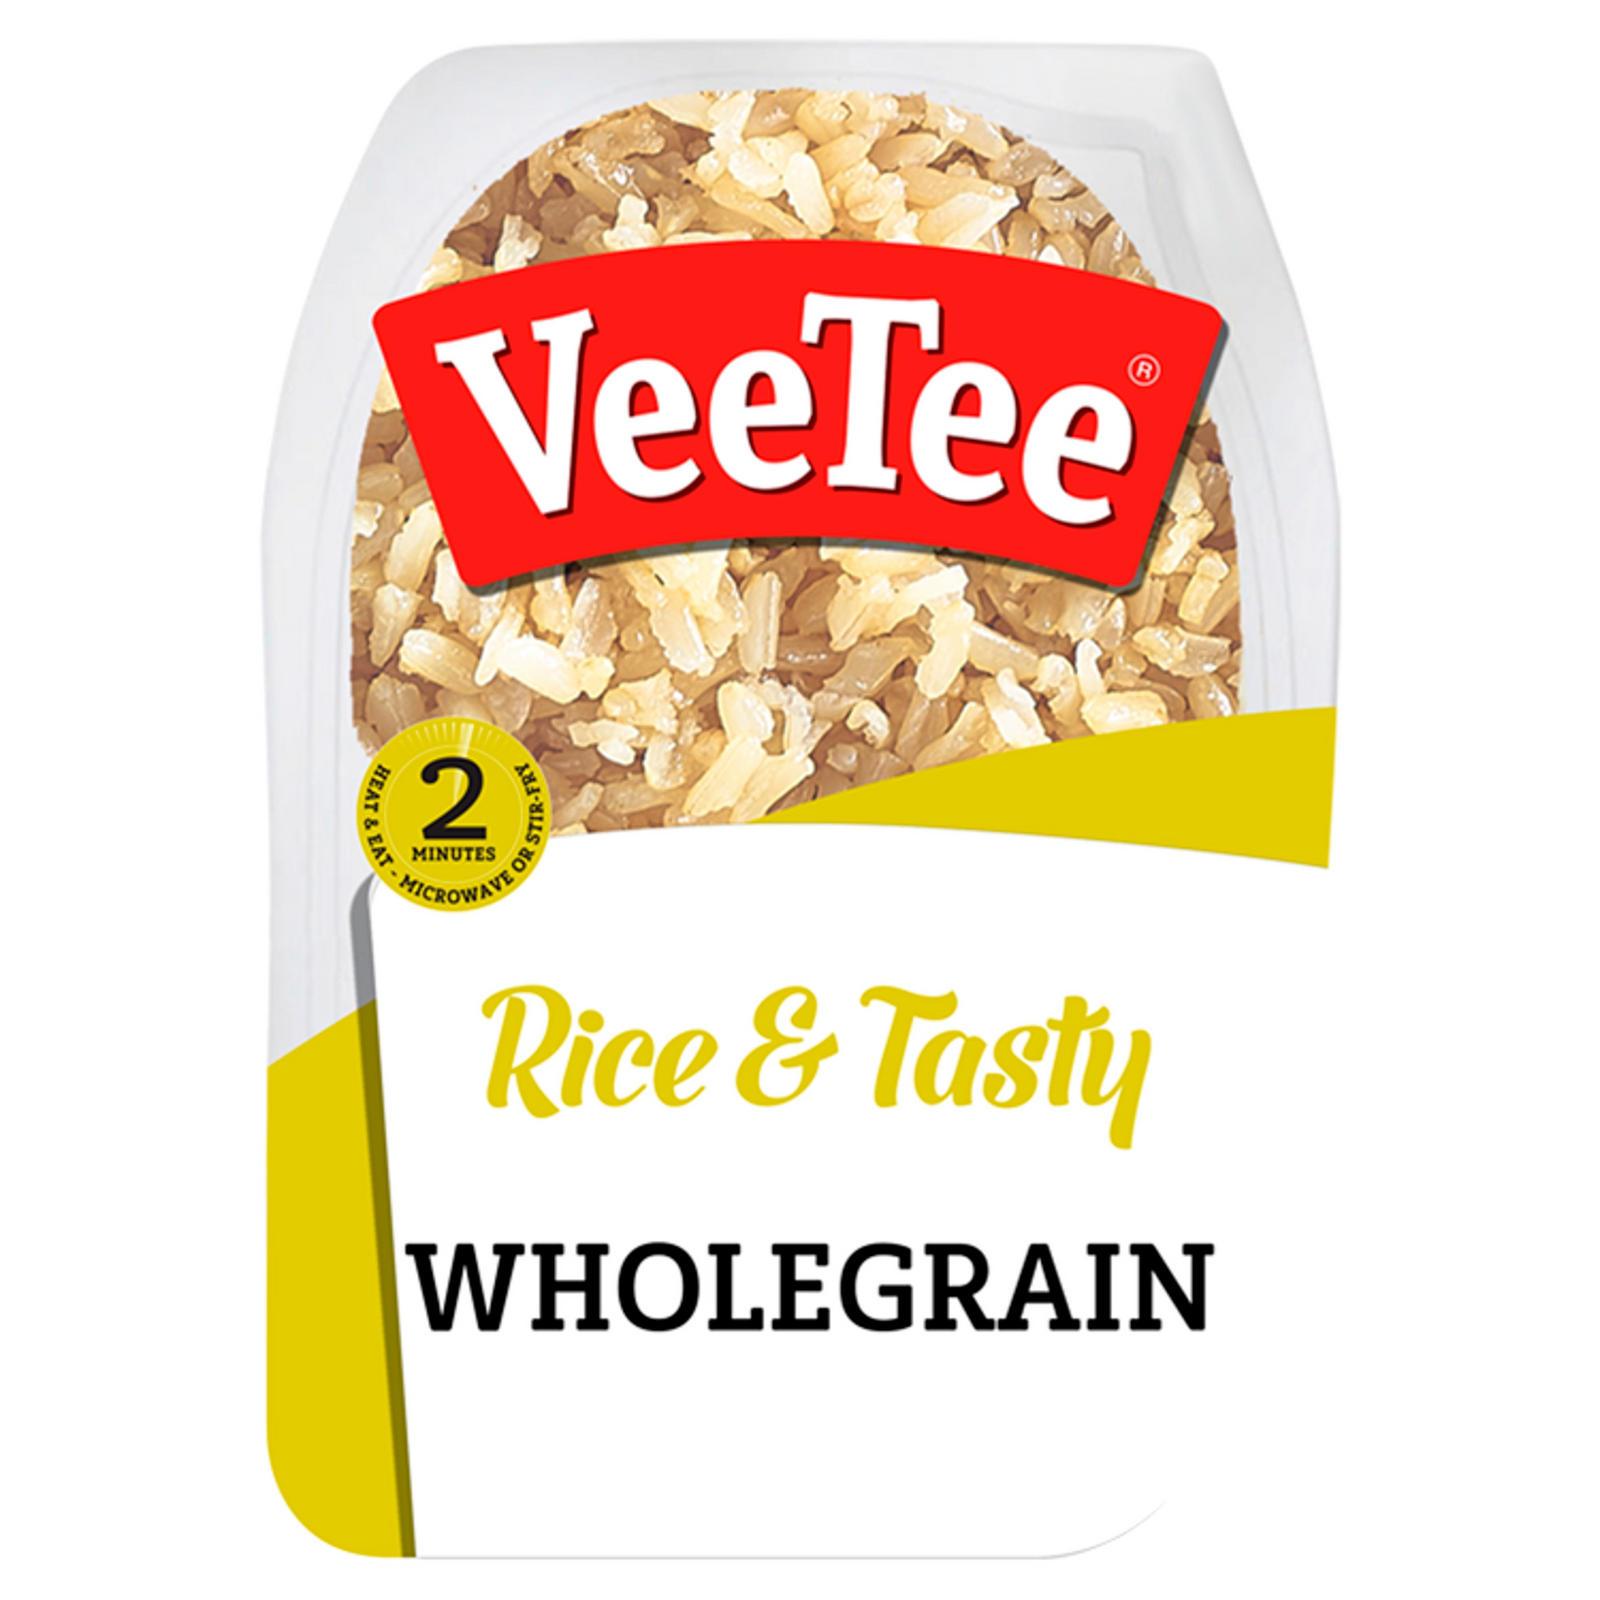 VeeTee Rice & Easy ? Wholegrain Rice 280g